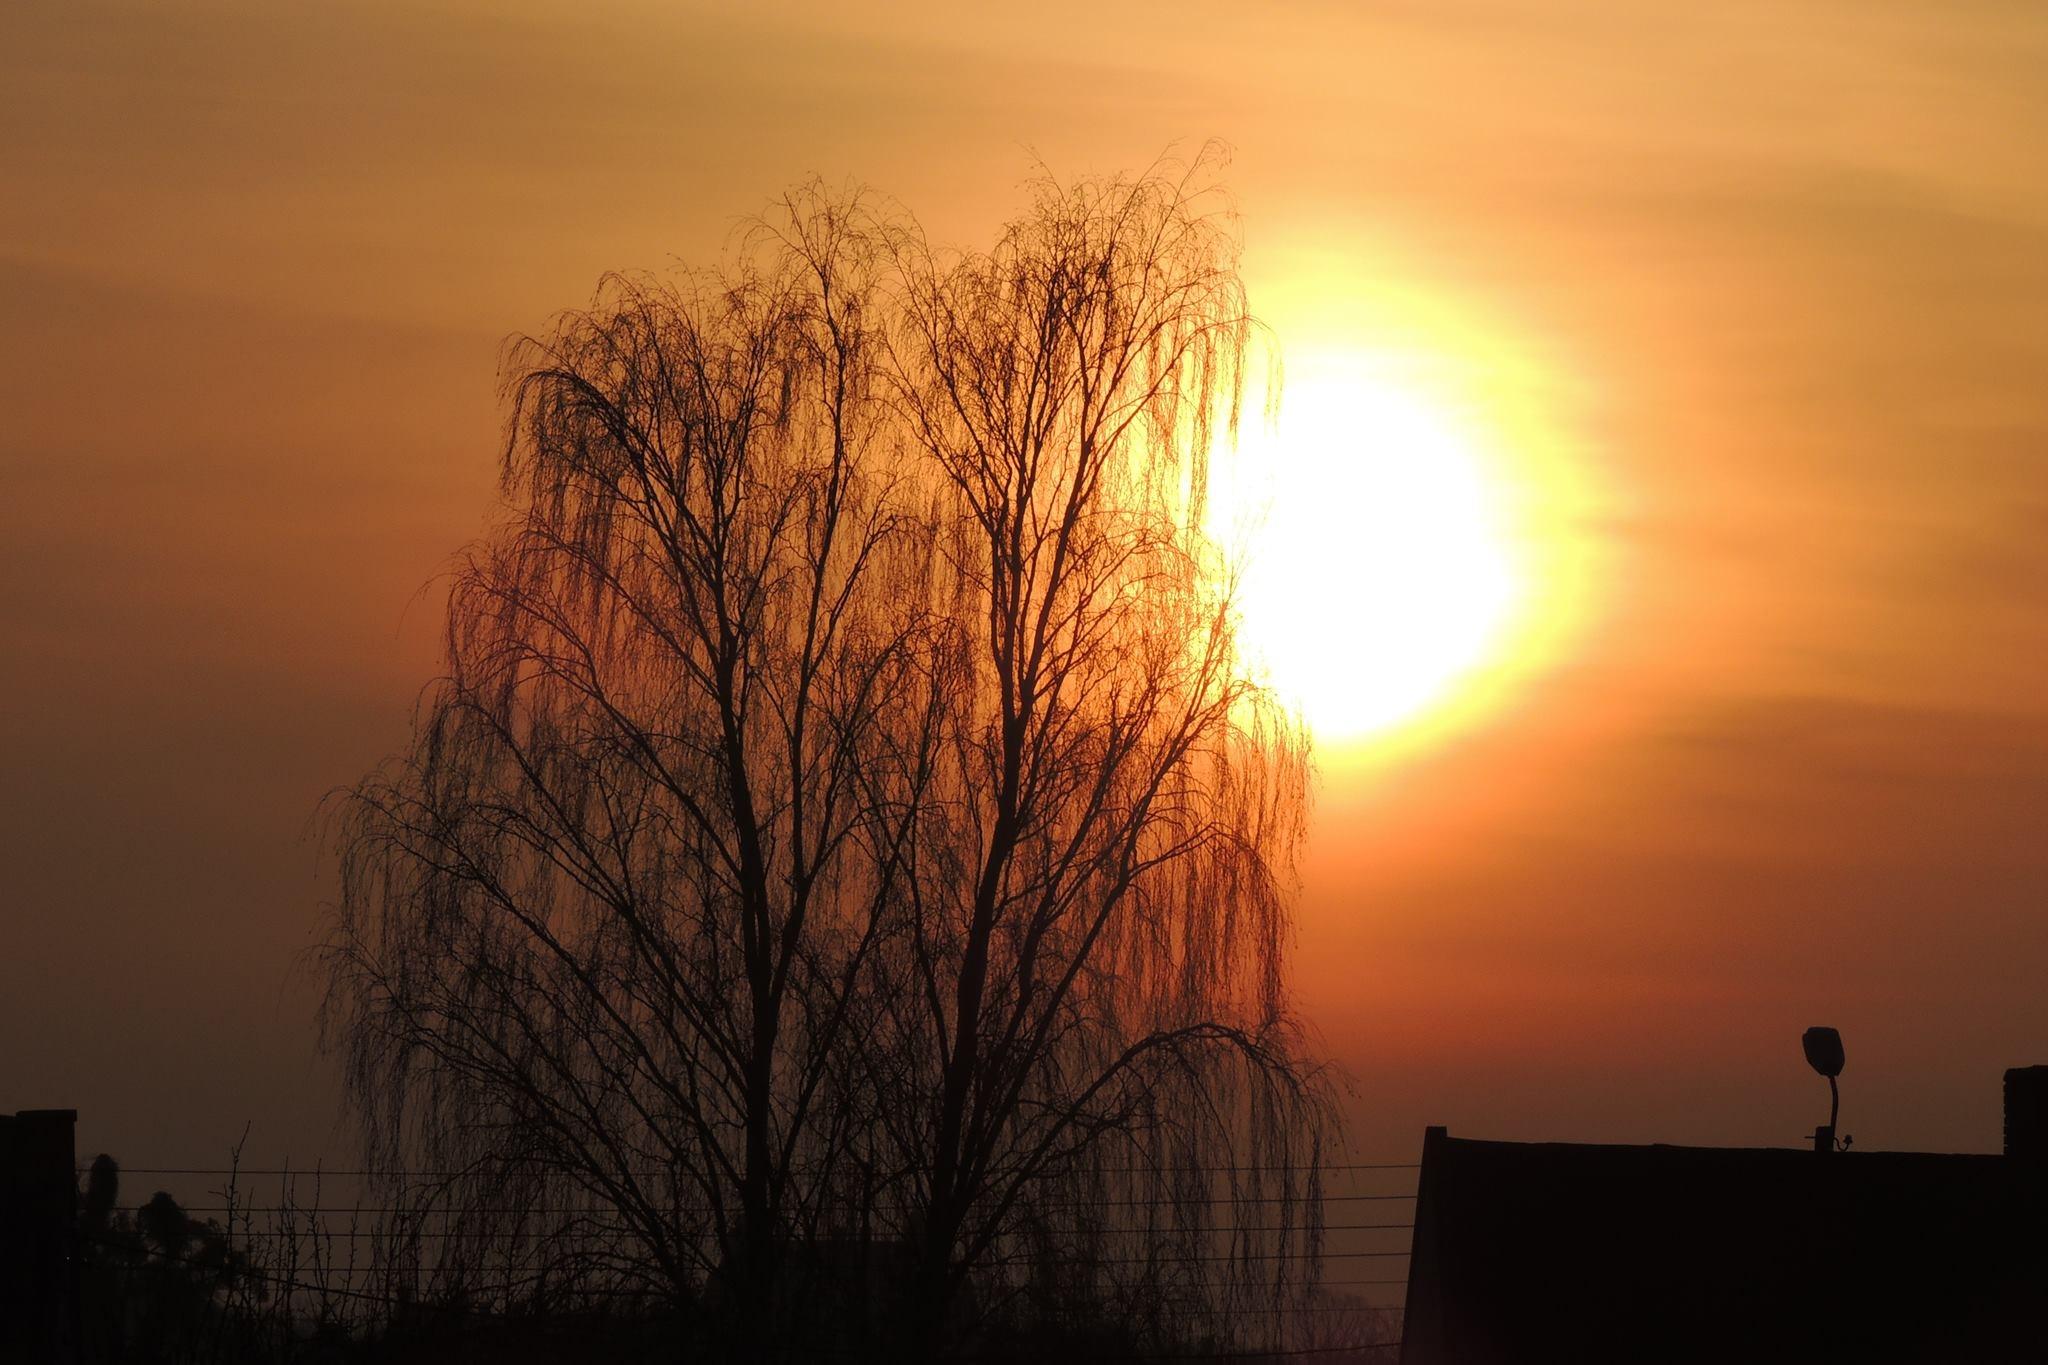 sunrise by B Tessa Marcinkowska